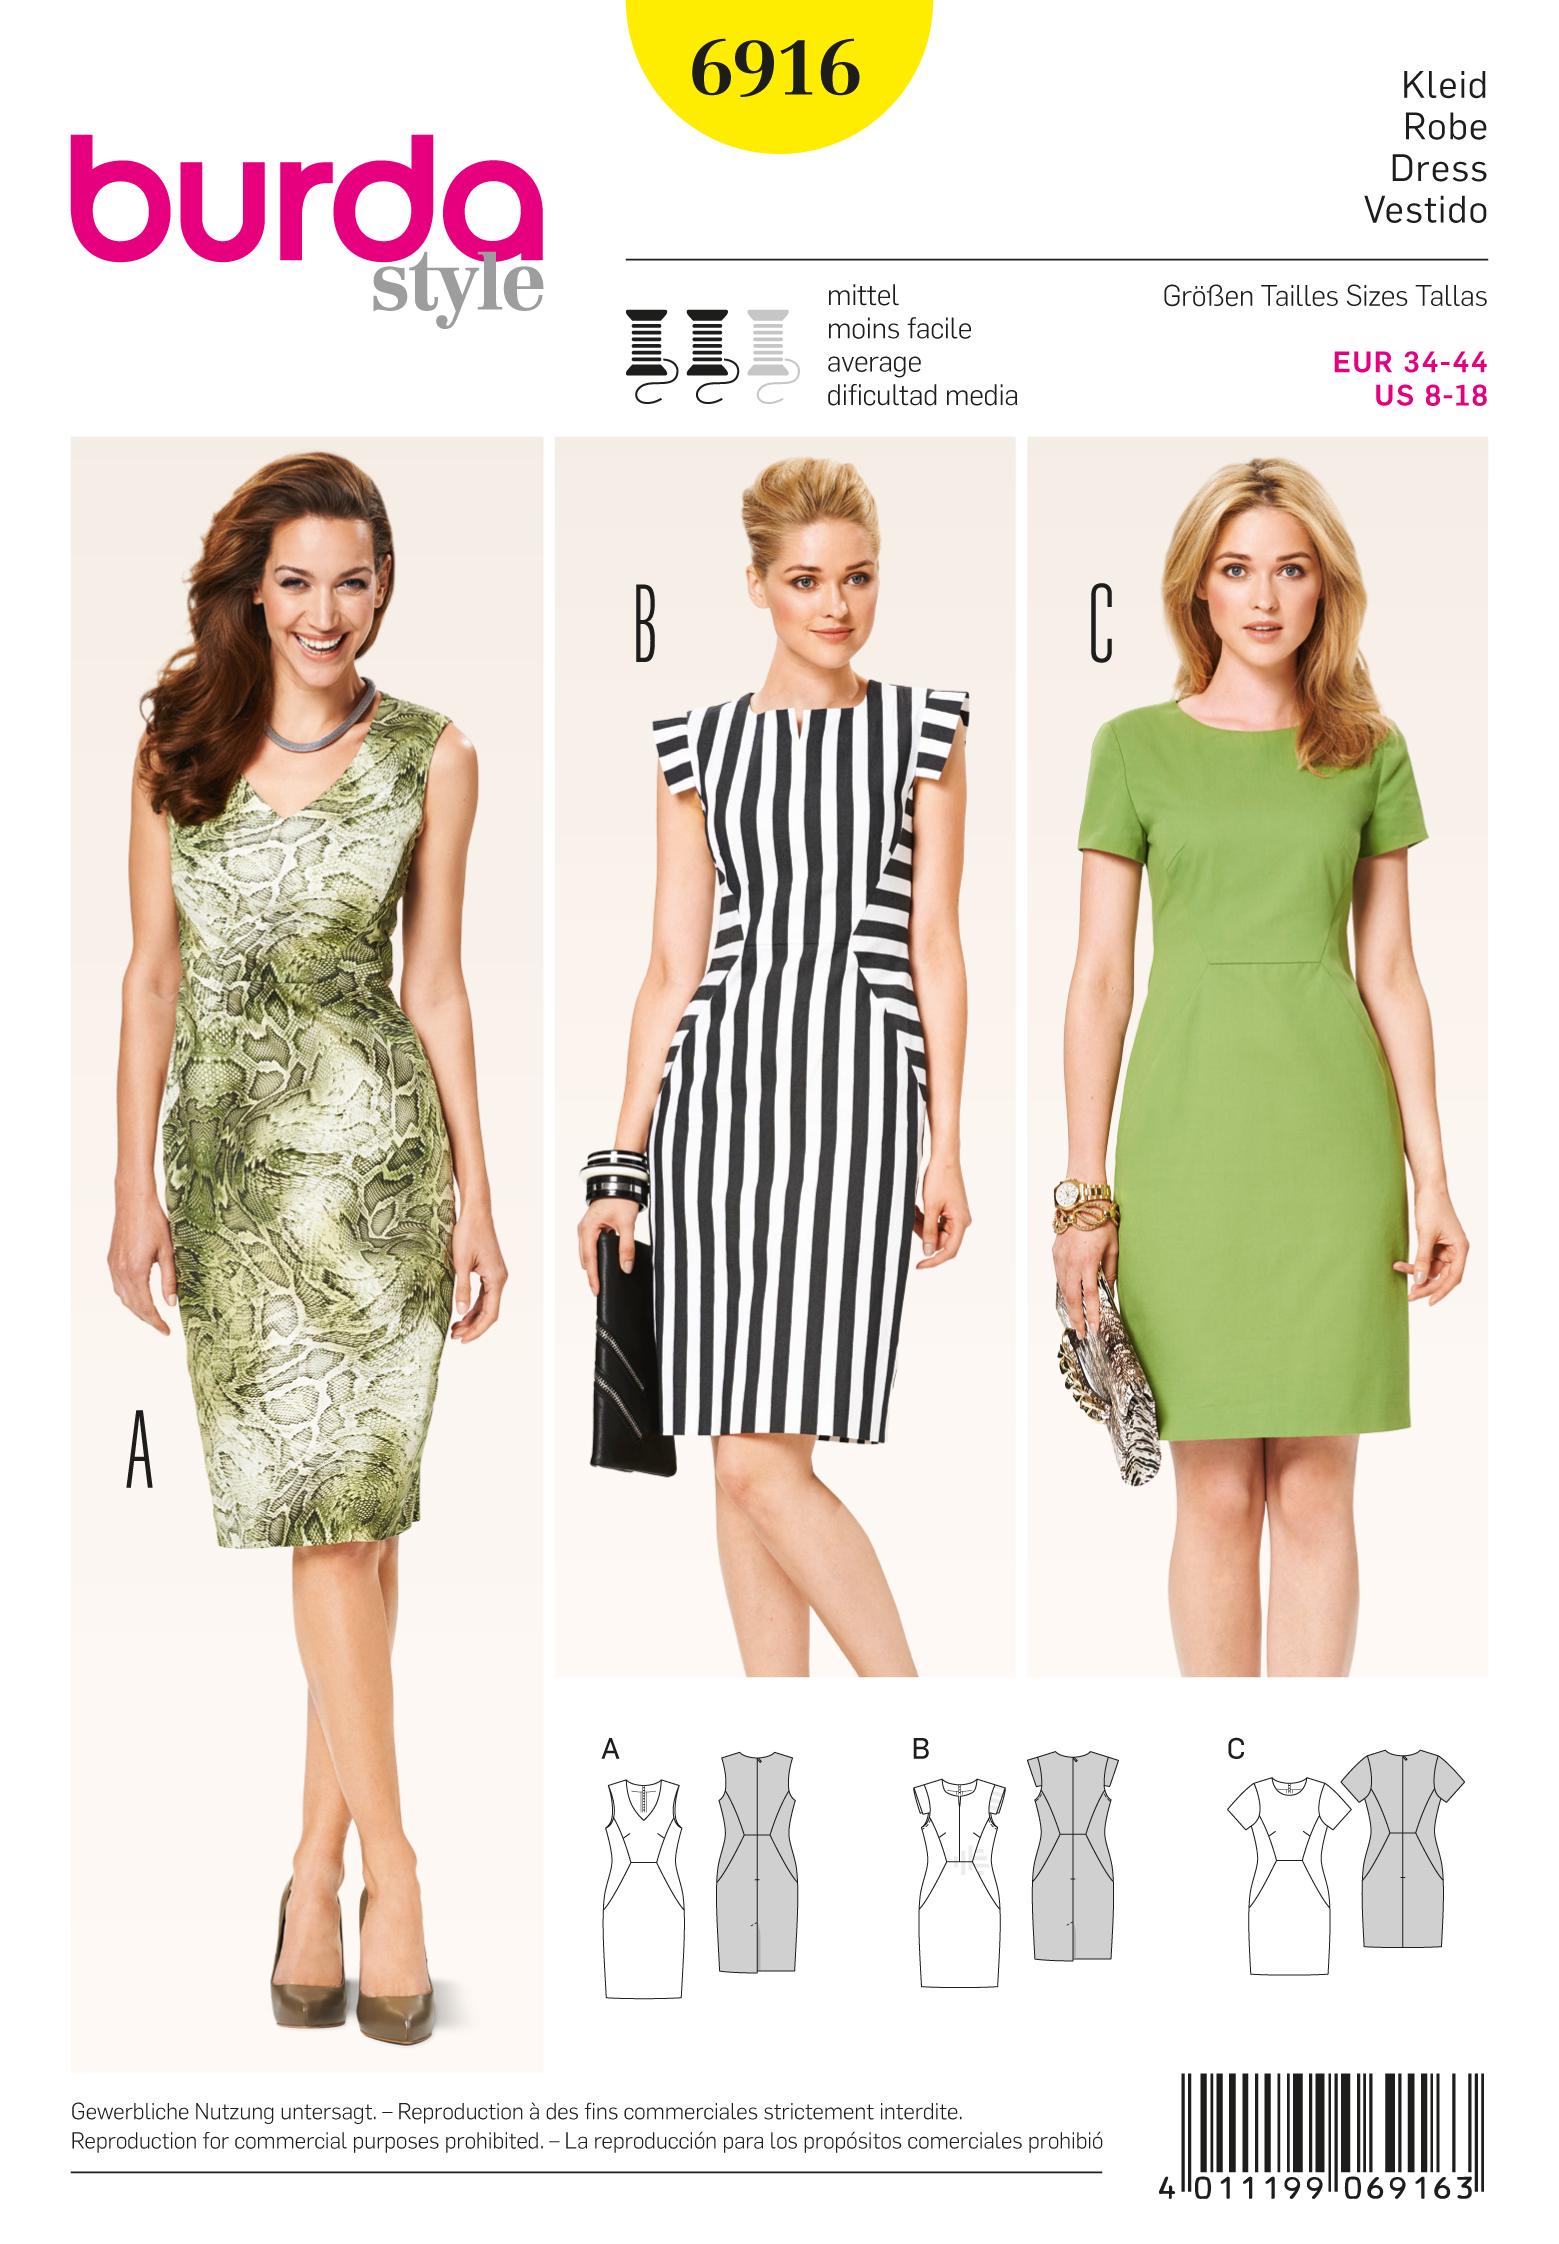 Burda 6916 Dresses